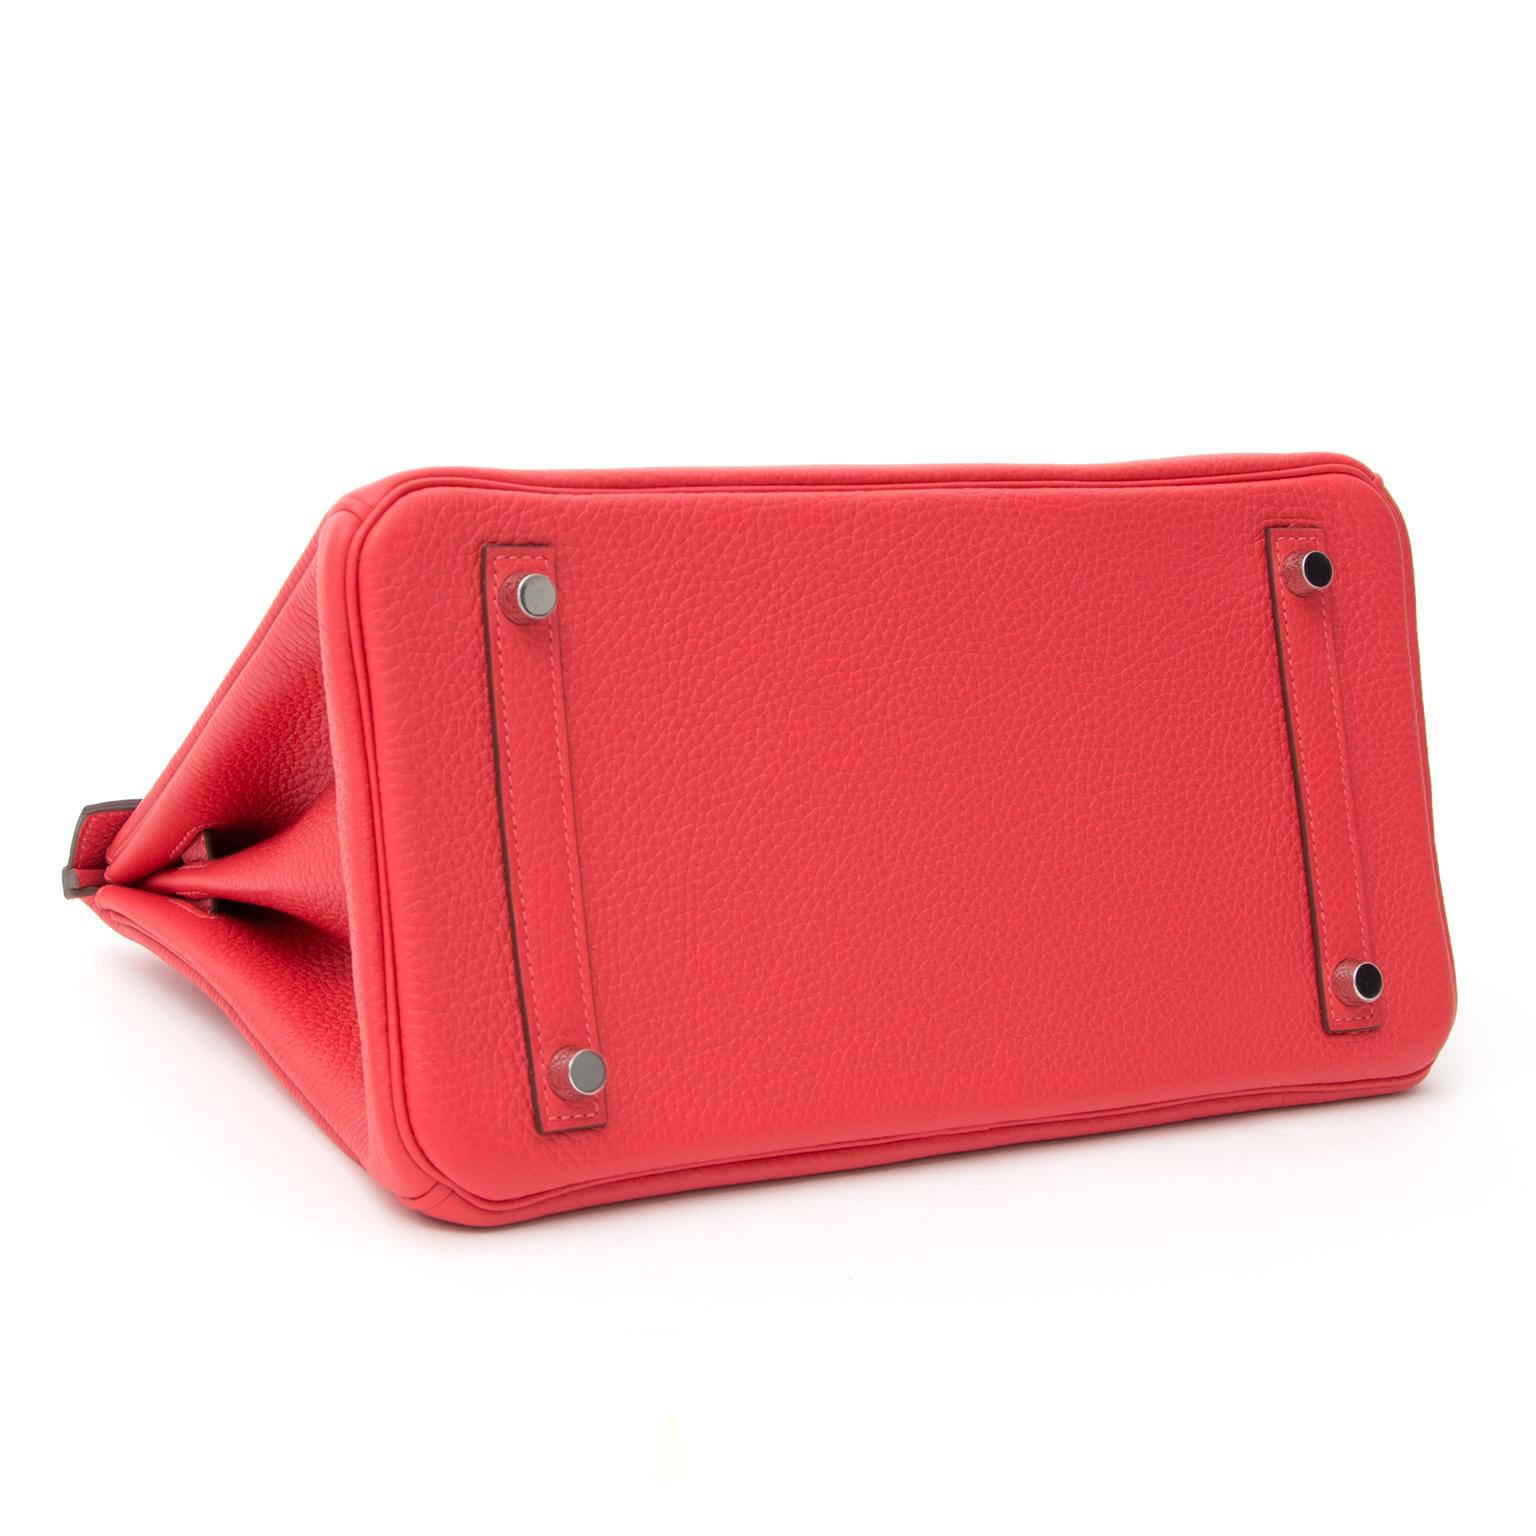 BRAND NEW Hermès Birkin Bag 30 Togo Rouge Pivoine PHW Buy authentic secondhand Hermès bags at the right price at LabelLOV vintage webshop. Safe and secure online shopping. Koop authentieke tweedehands Hermès tassen aan de juiste prijs bij LabelLOV webshop